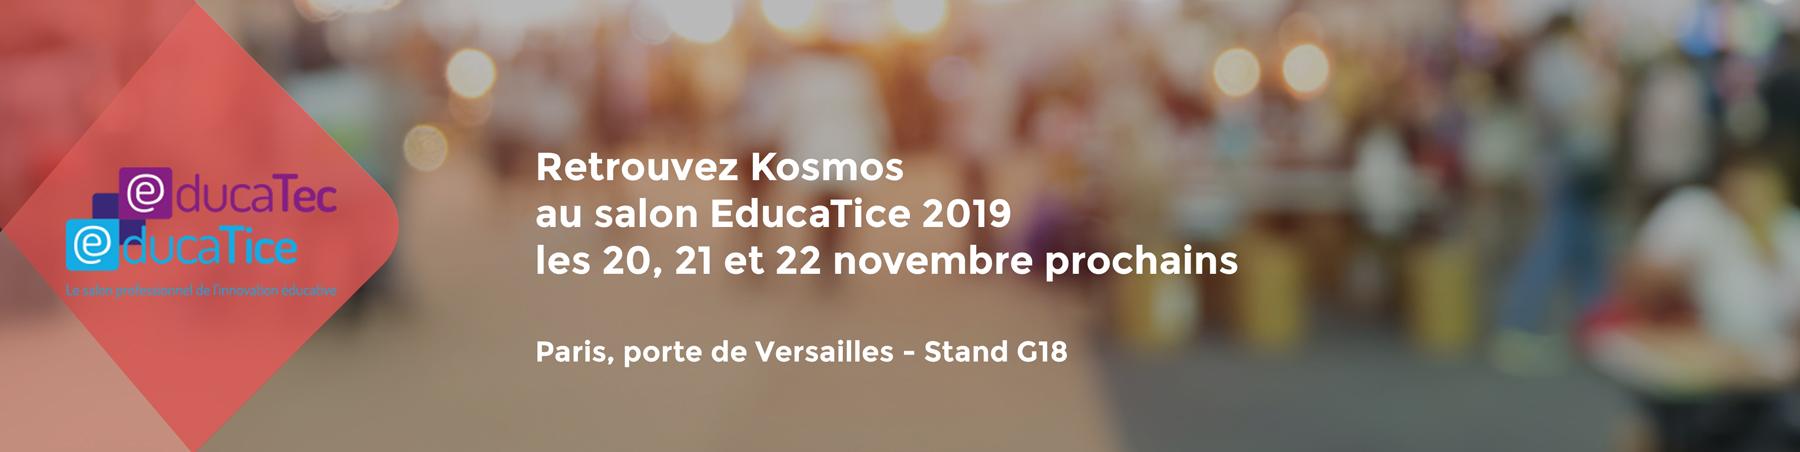 educatice 2019